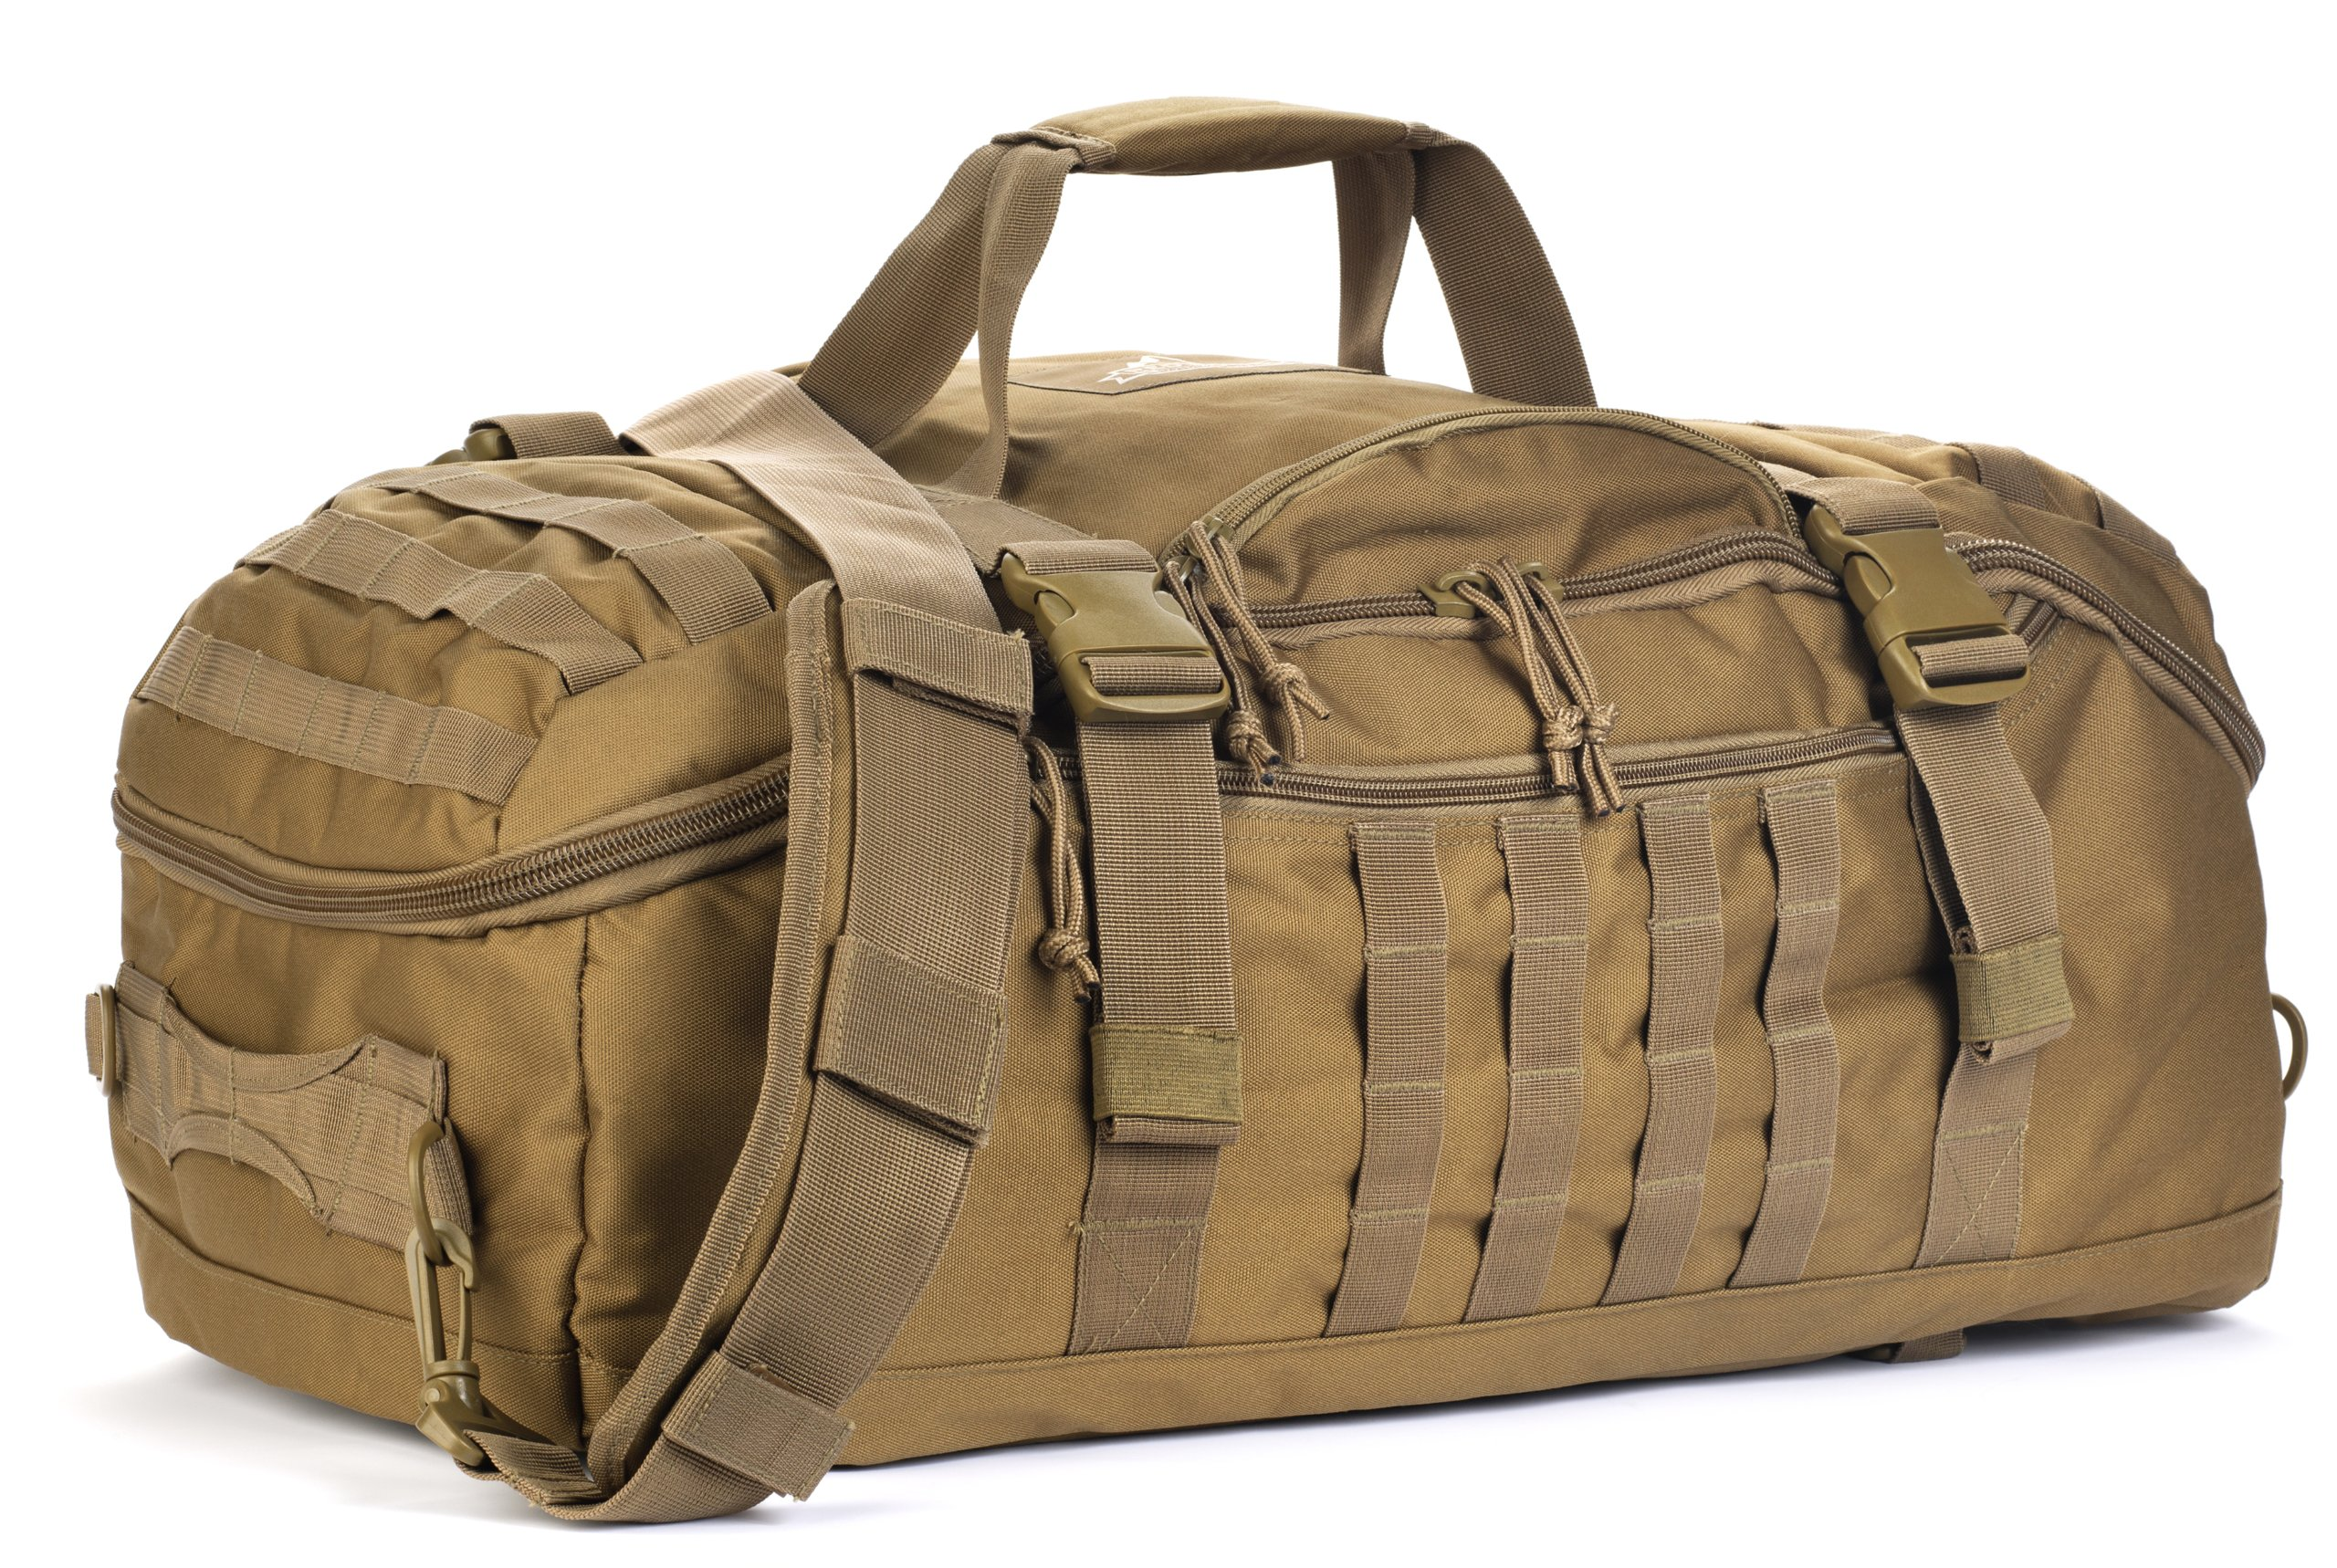 Red Rock Outdoor Gear Traveler Duffle Bag (Coyote)